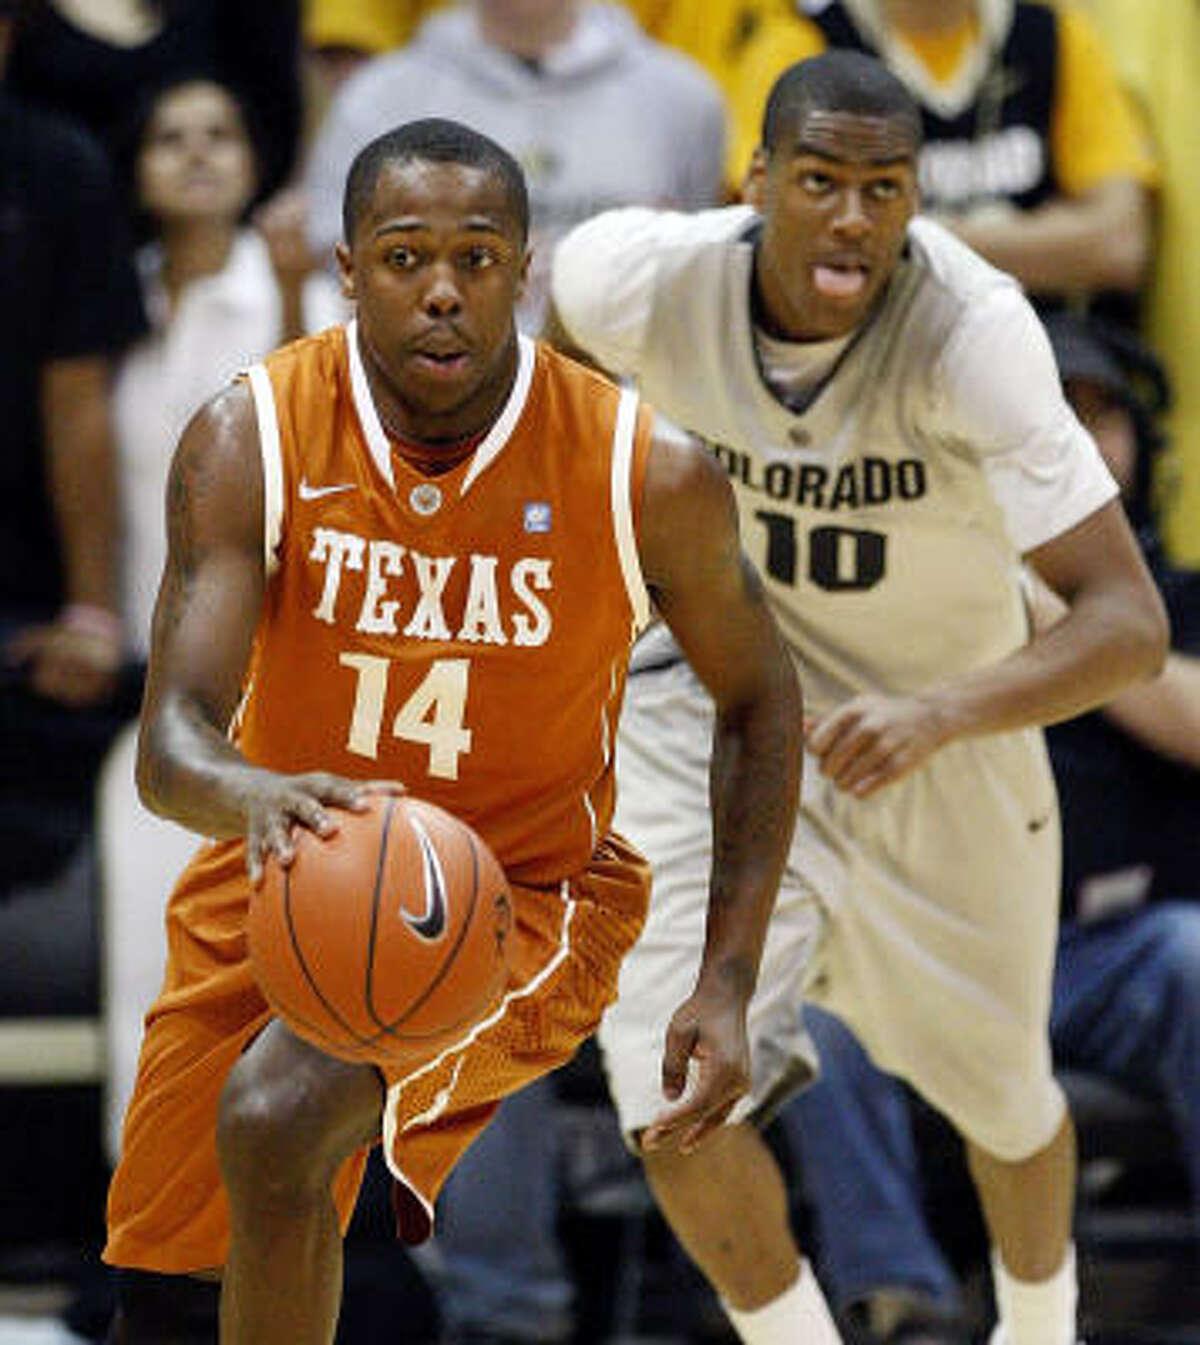 Texas guard J'Covan Brown drives the ball up court as Colorado guard Alec Burks gives chase.